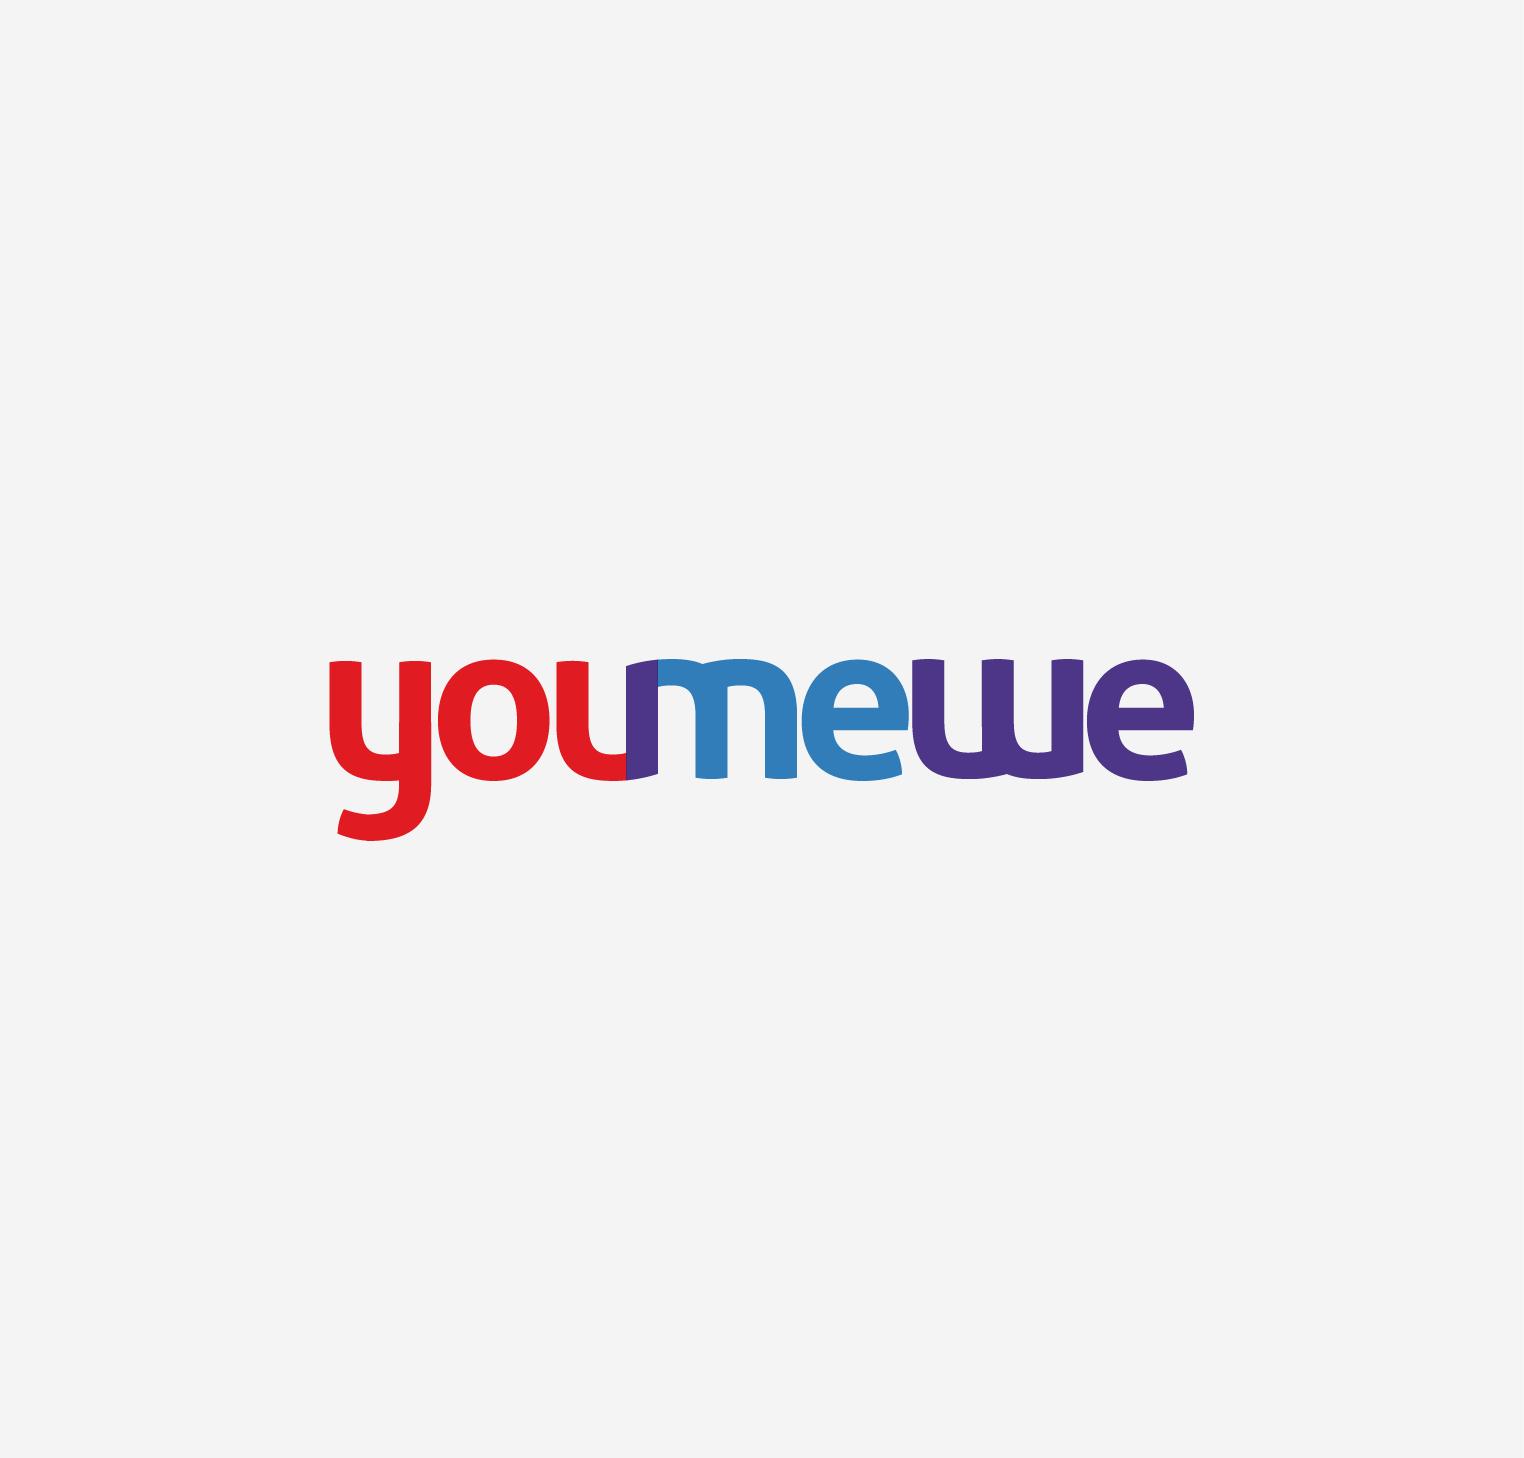 Logo_youmewe.png